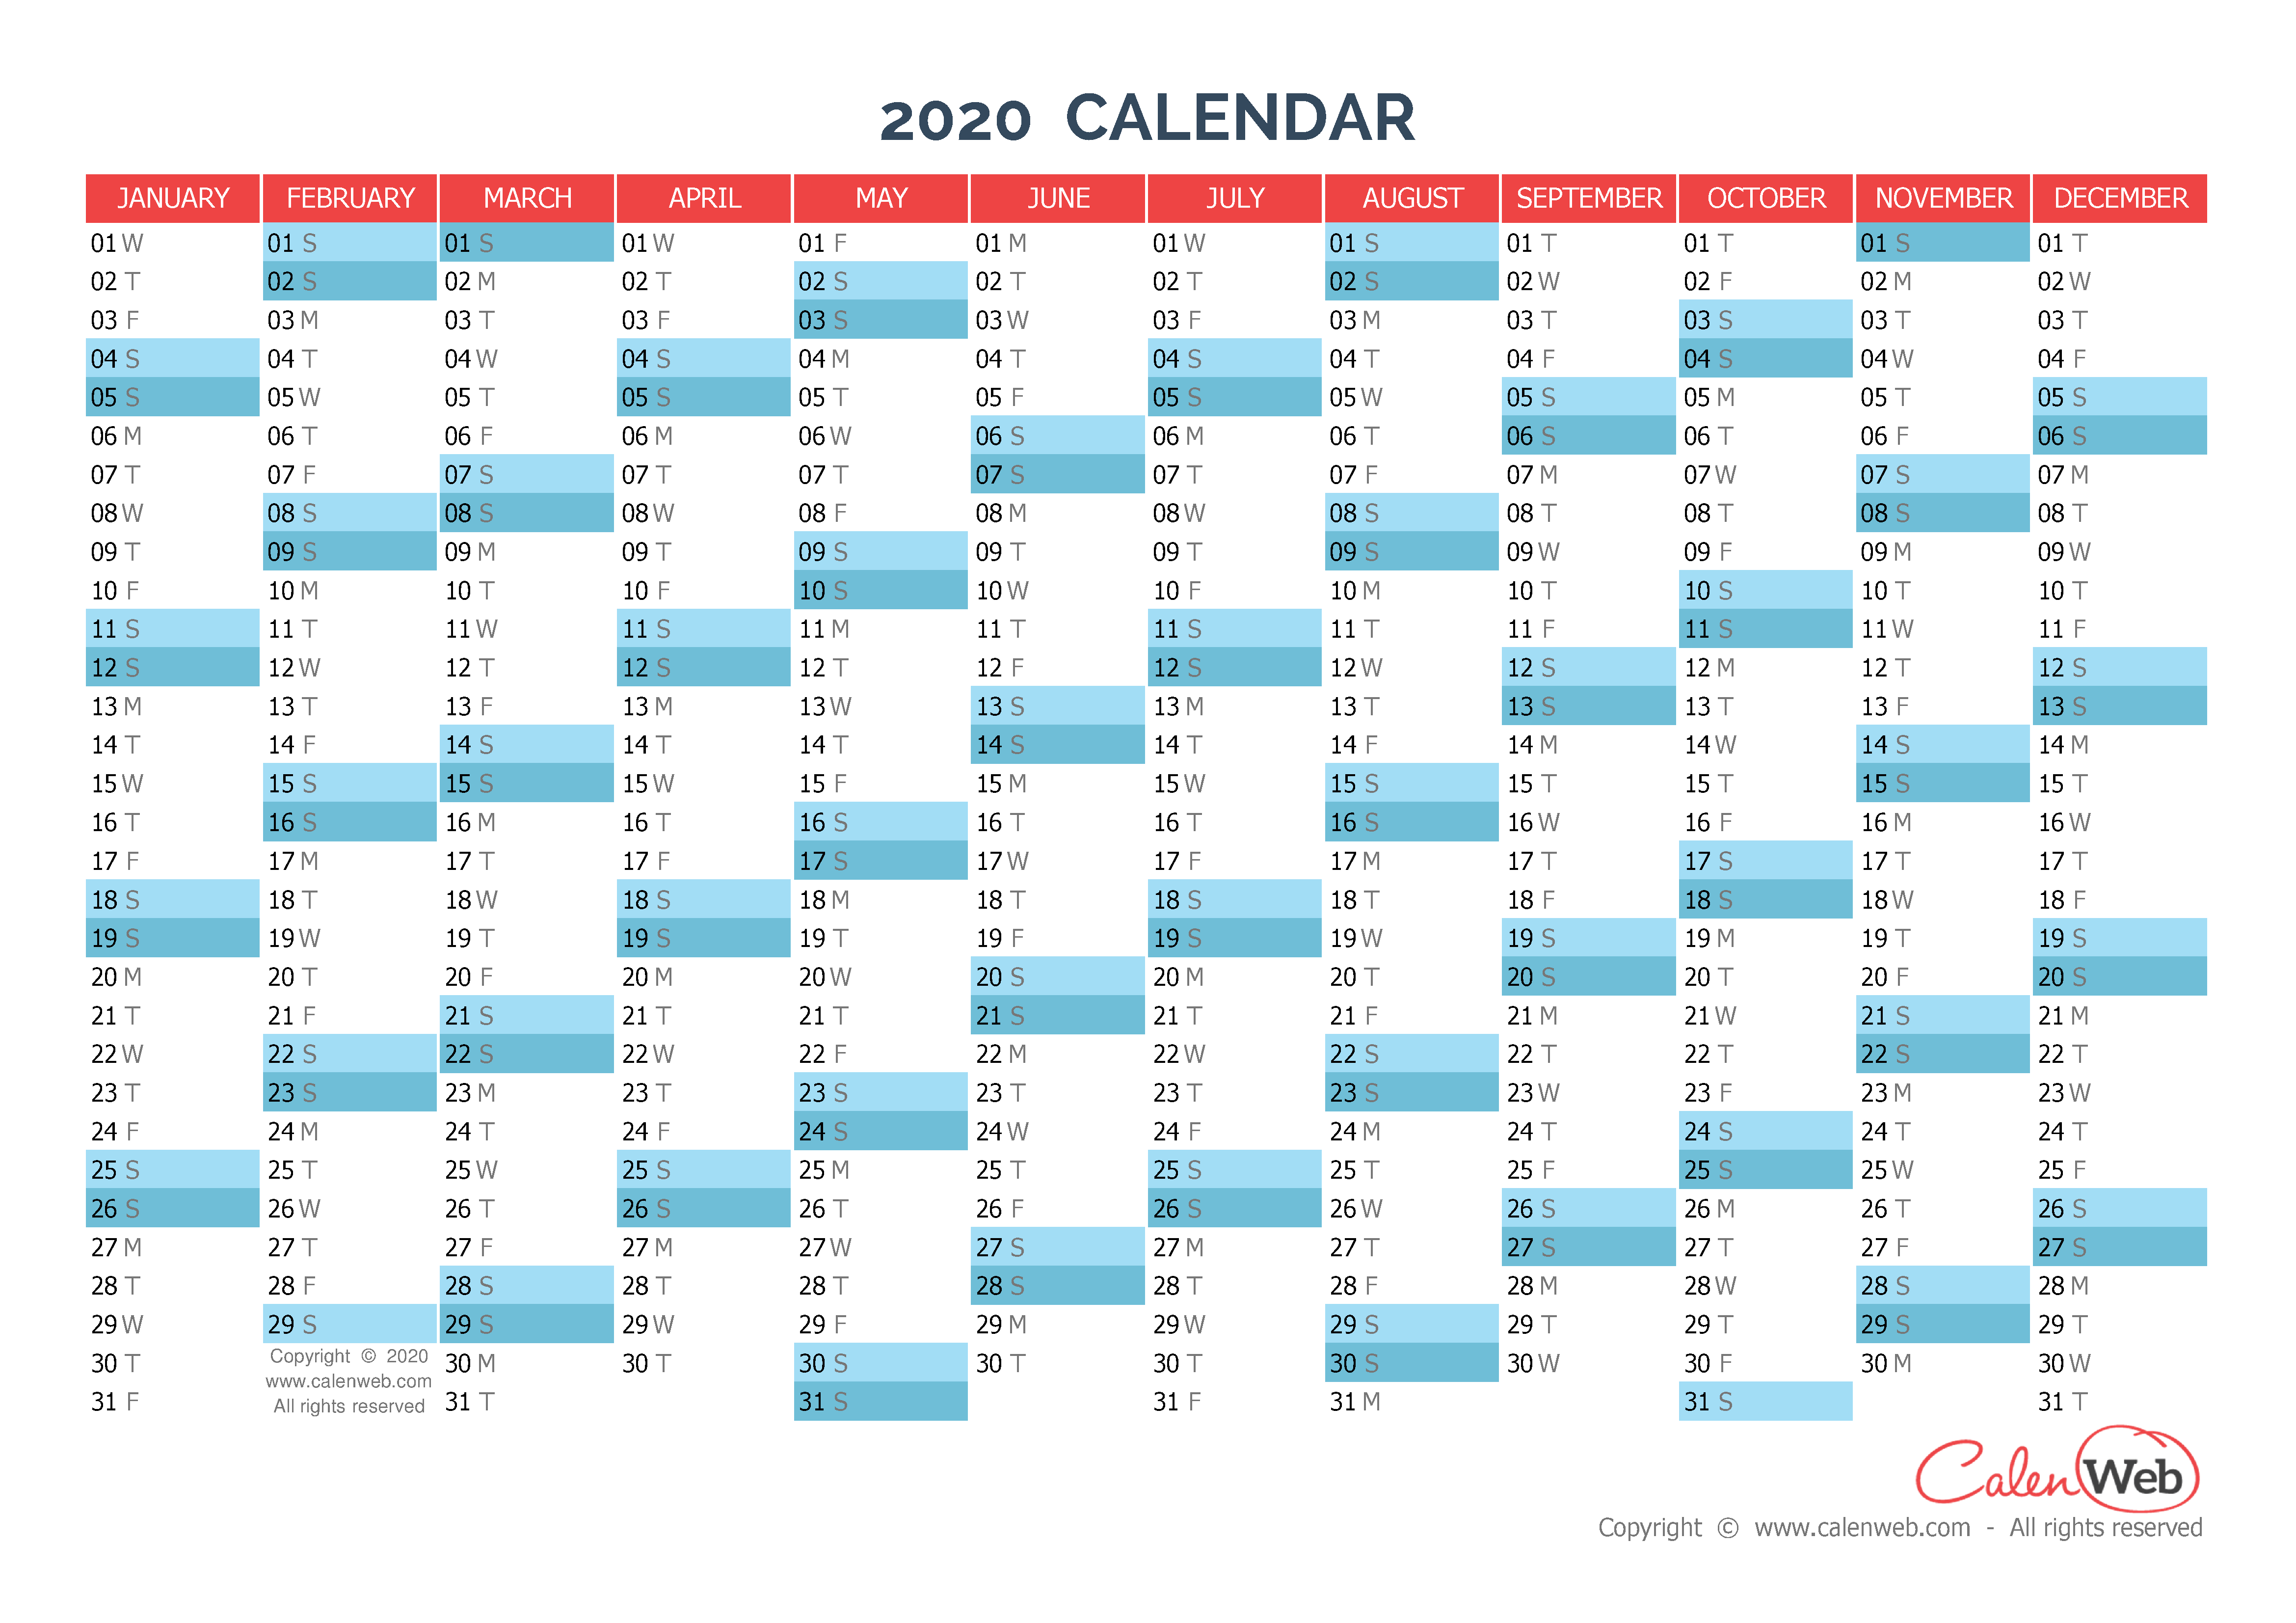 2020 Planner Calendar Yearly calendar – Year 2020 Yearly horizontal planning   Calenweb.com